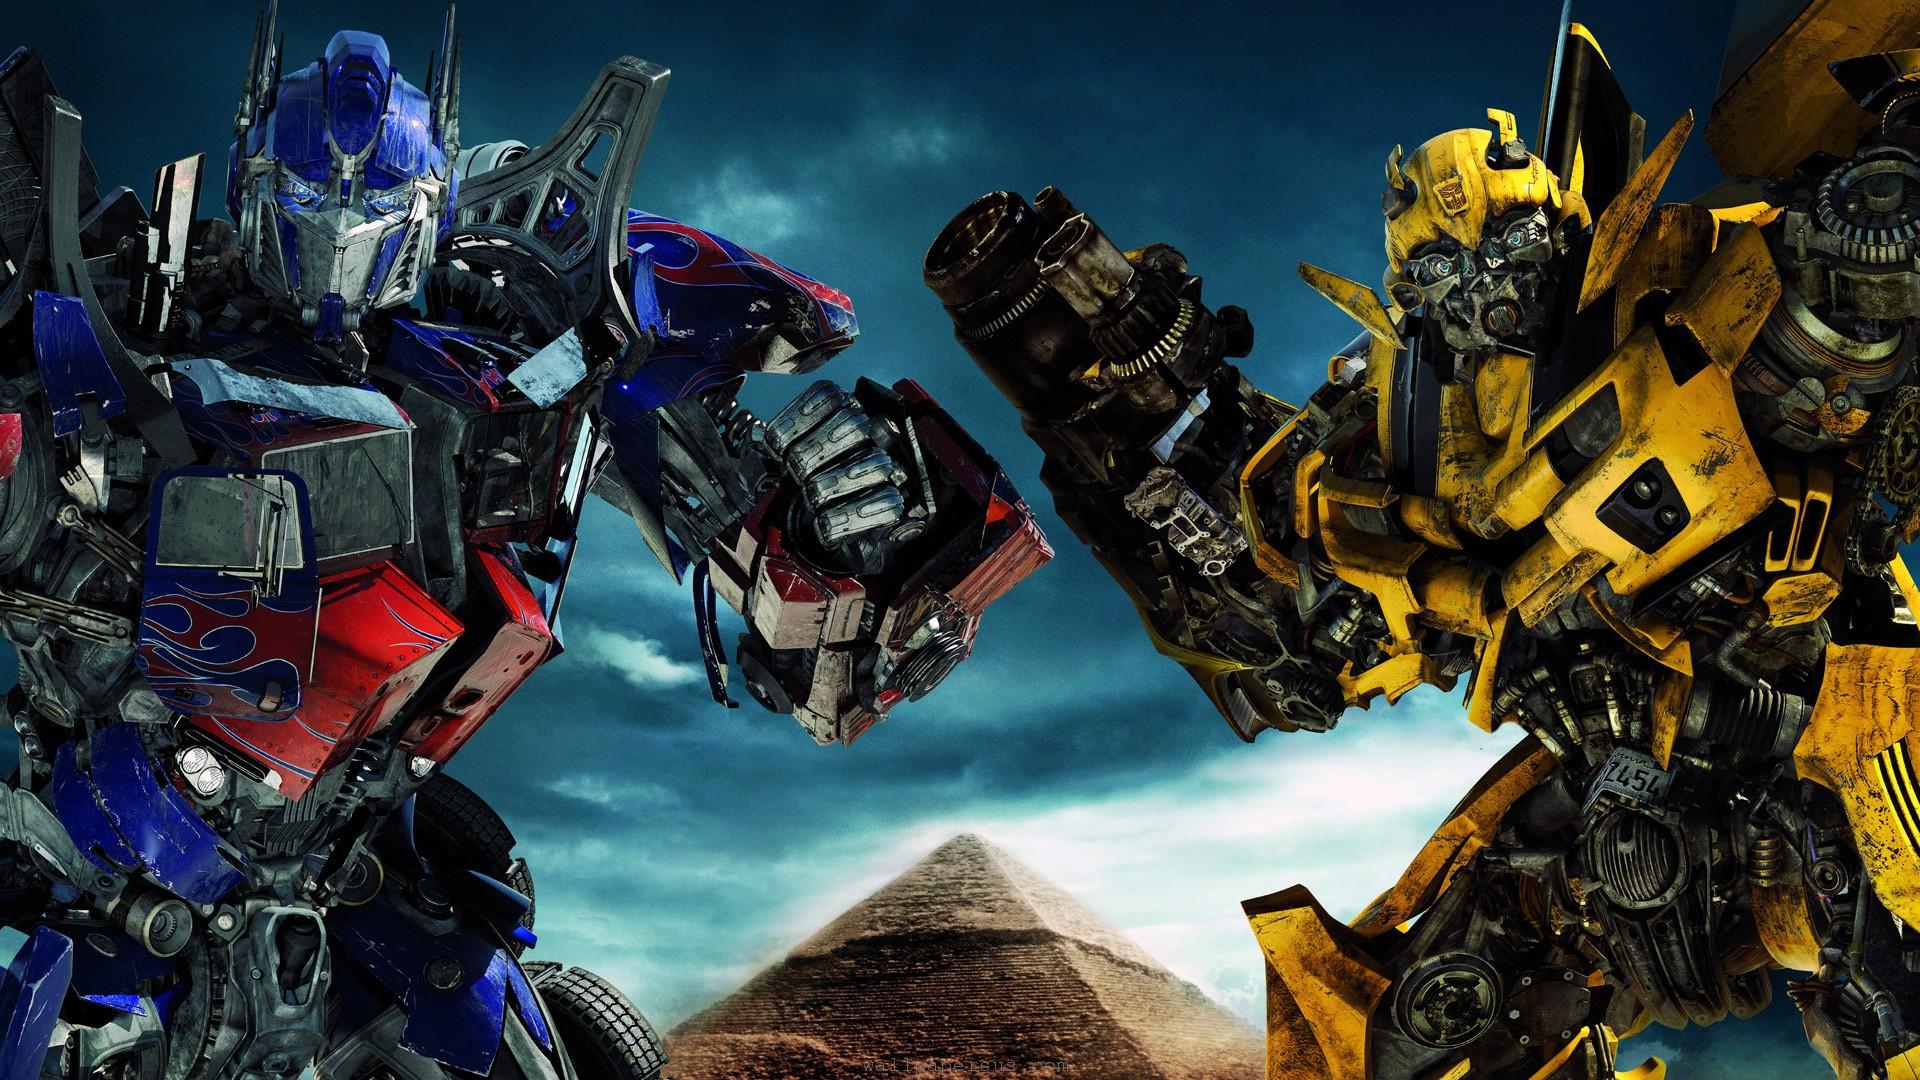 Transformers Films